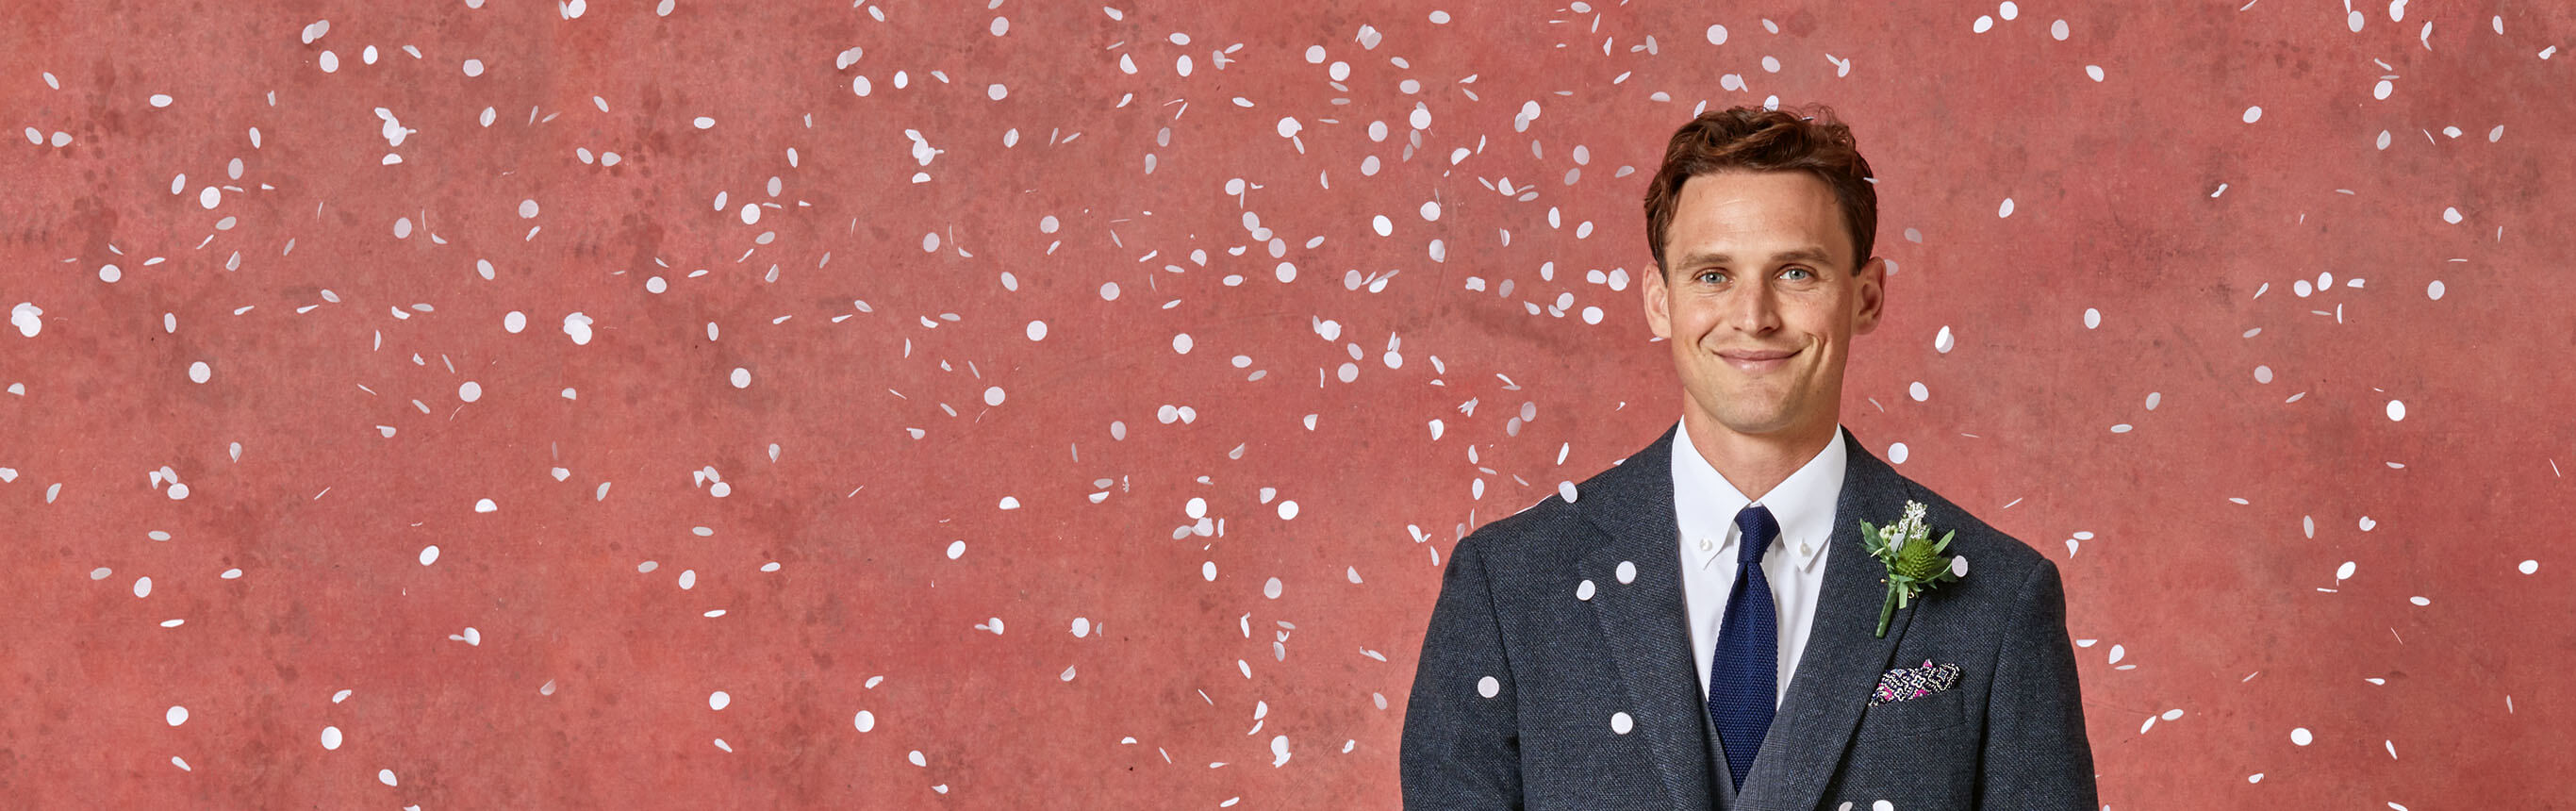 A man with confetti